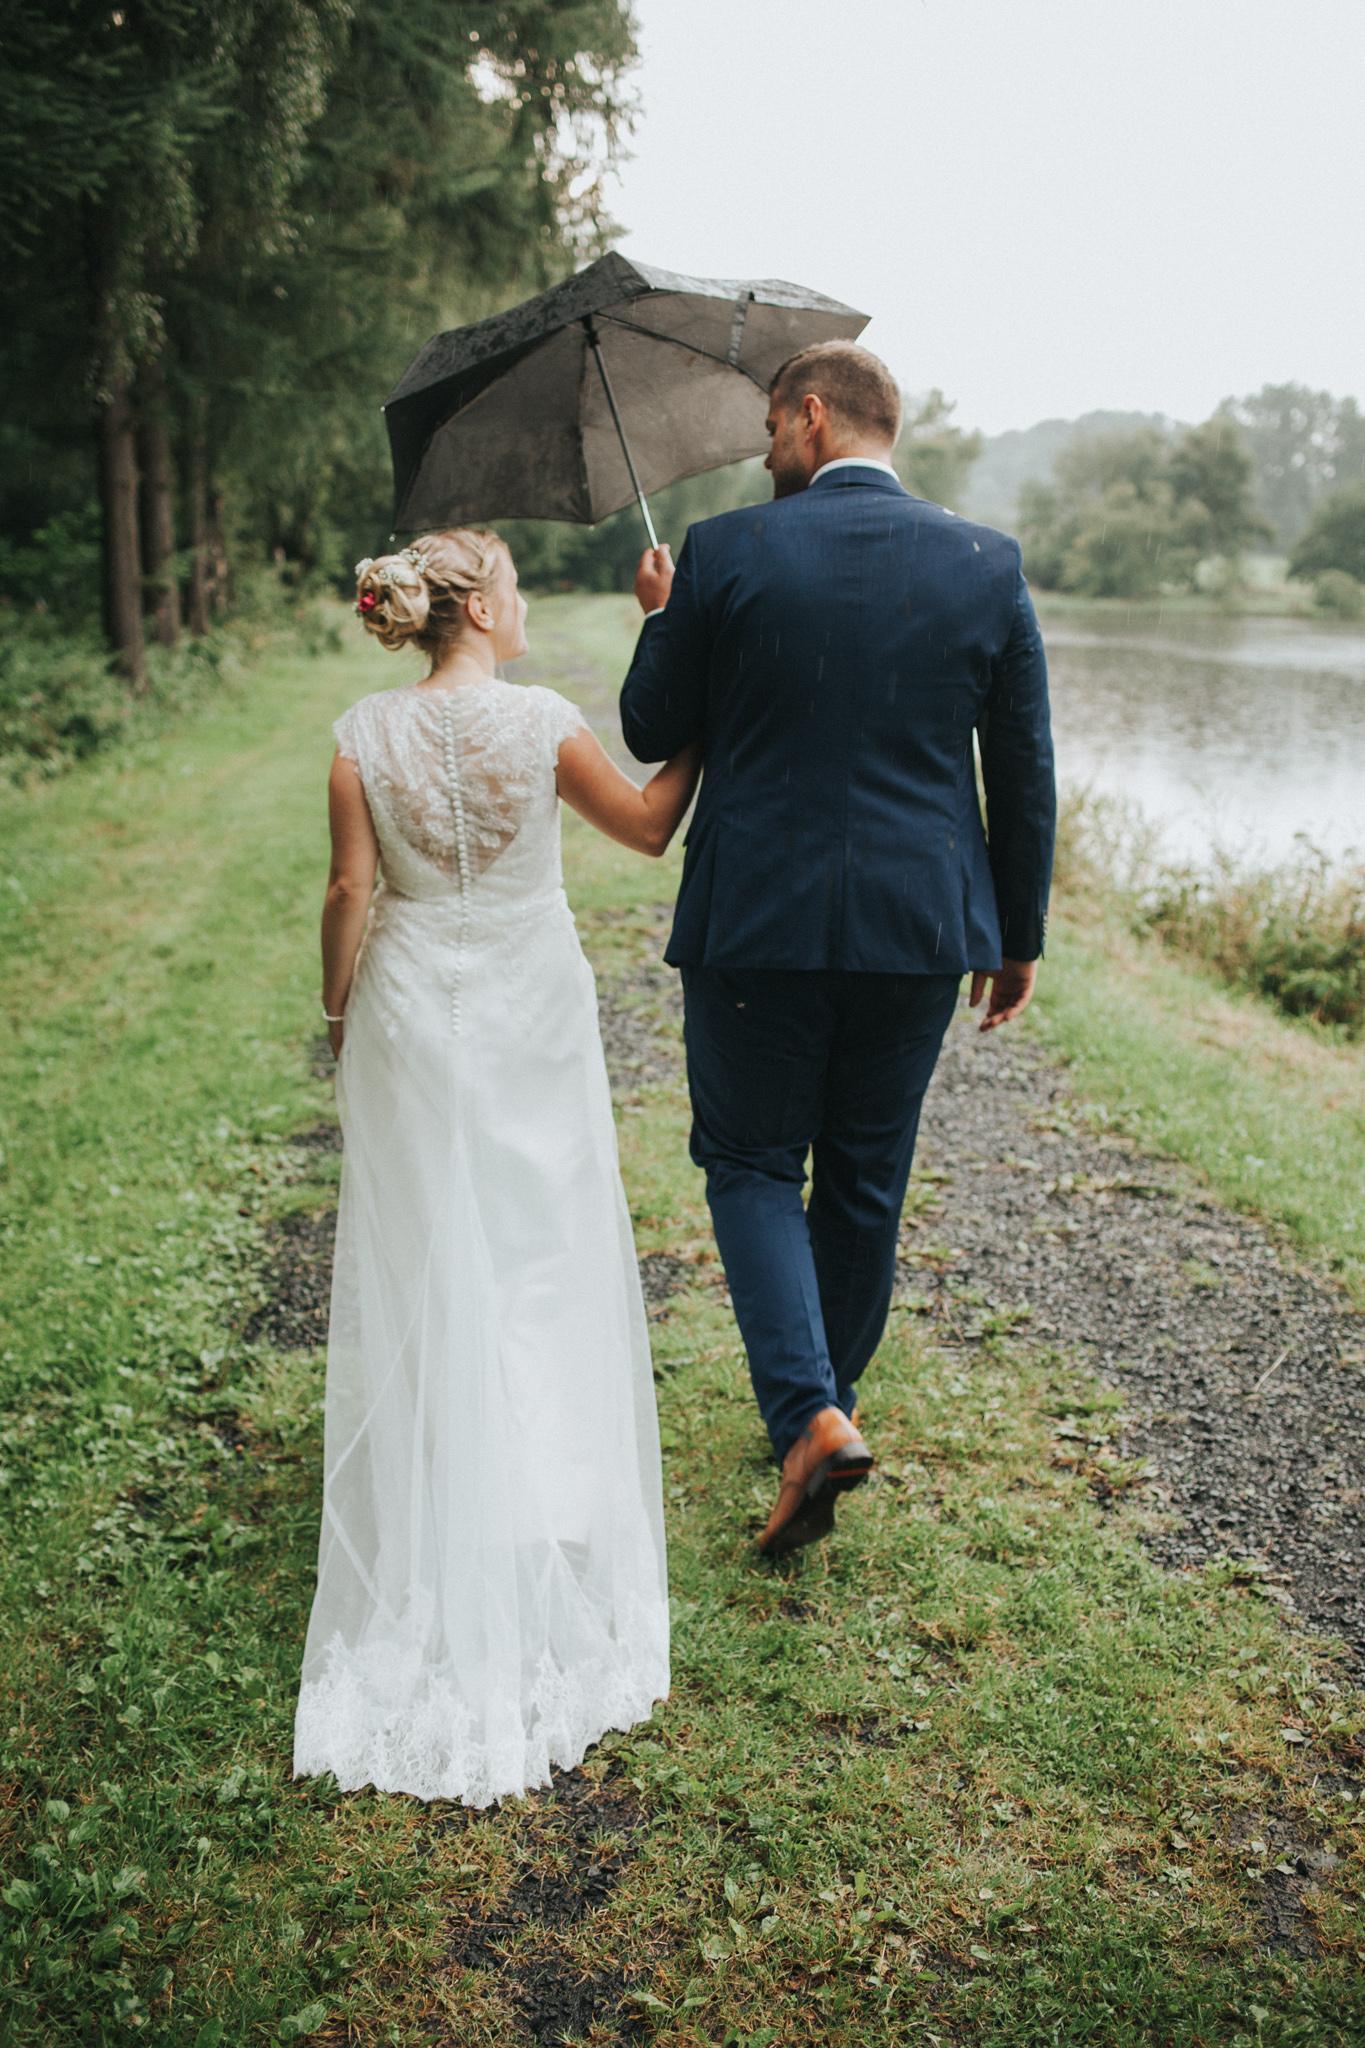 Hochzeitspaar unter Regenschirm